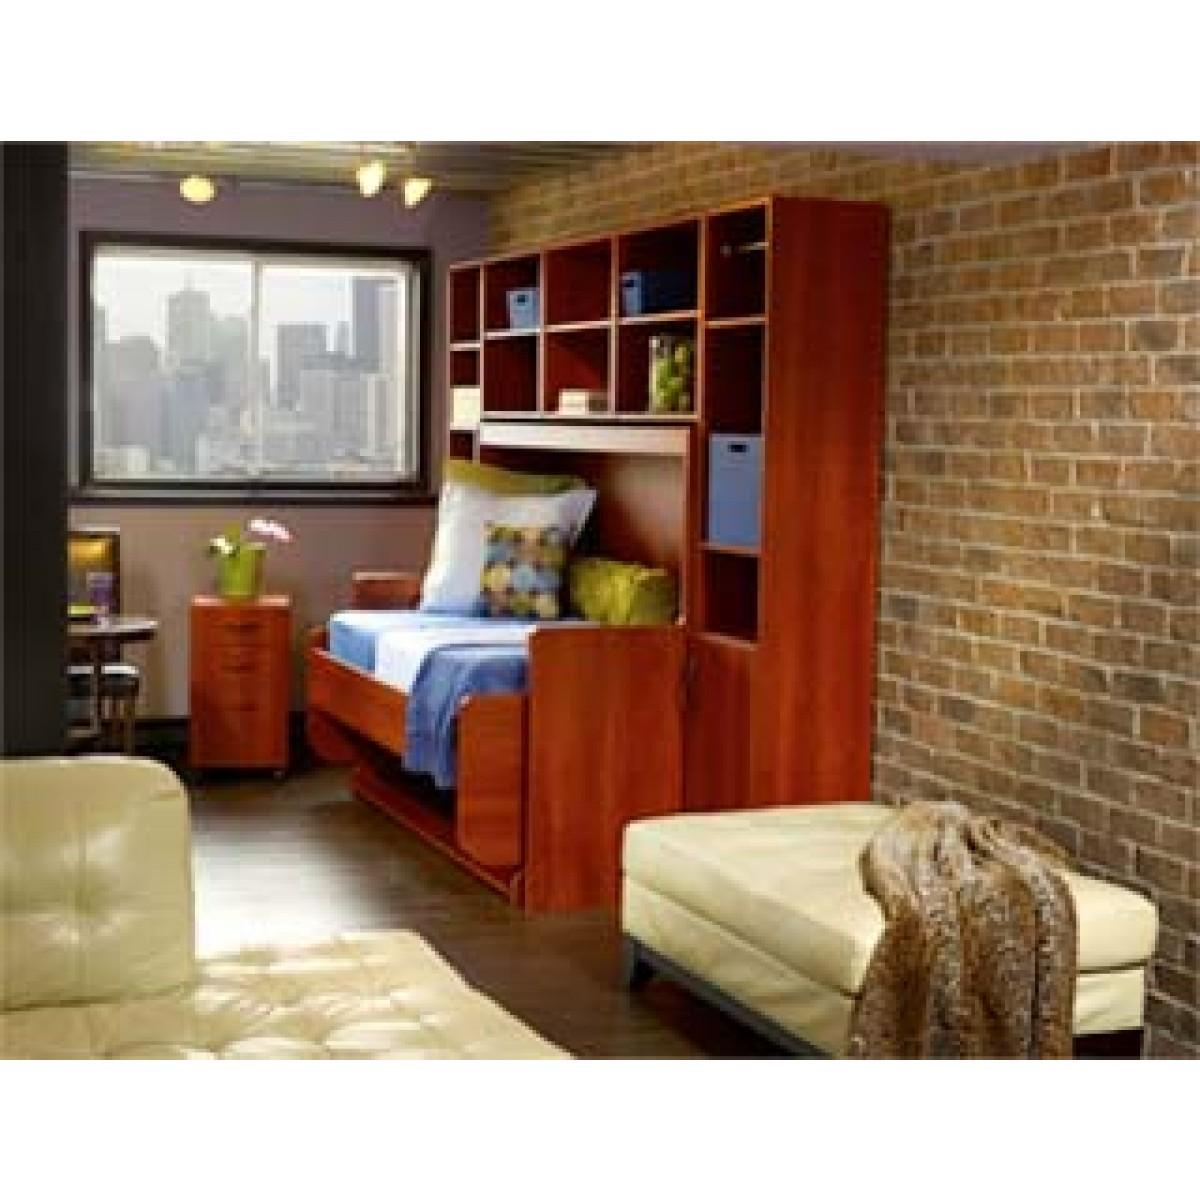 Design Hideaway Bed hideaway desk bed more views